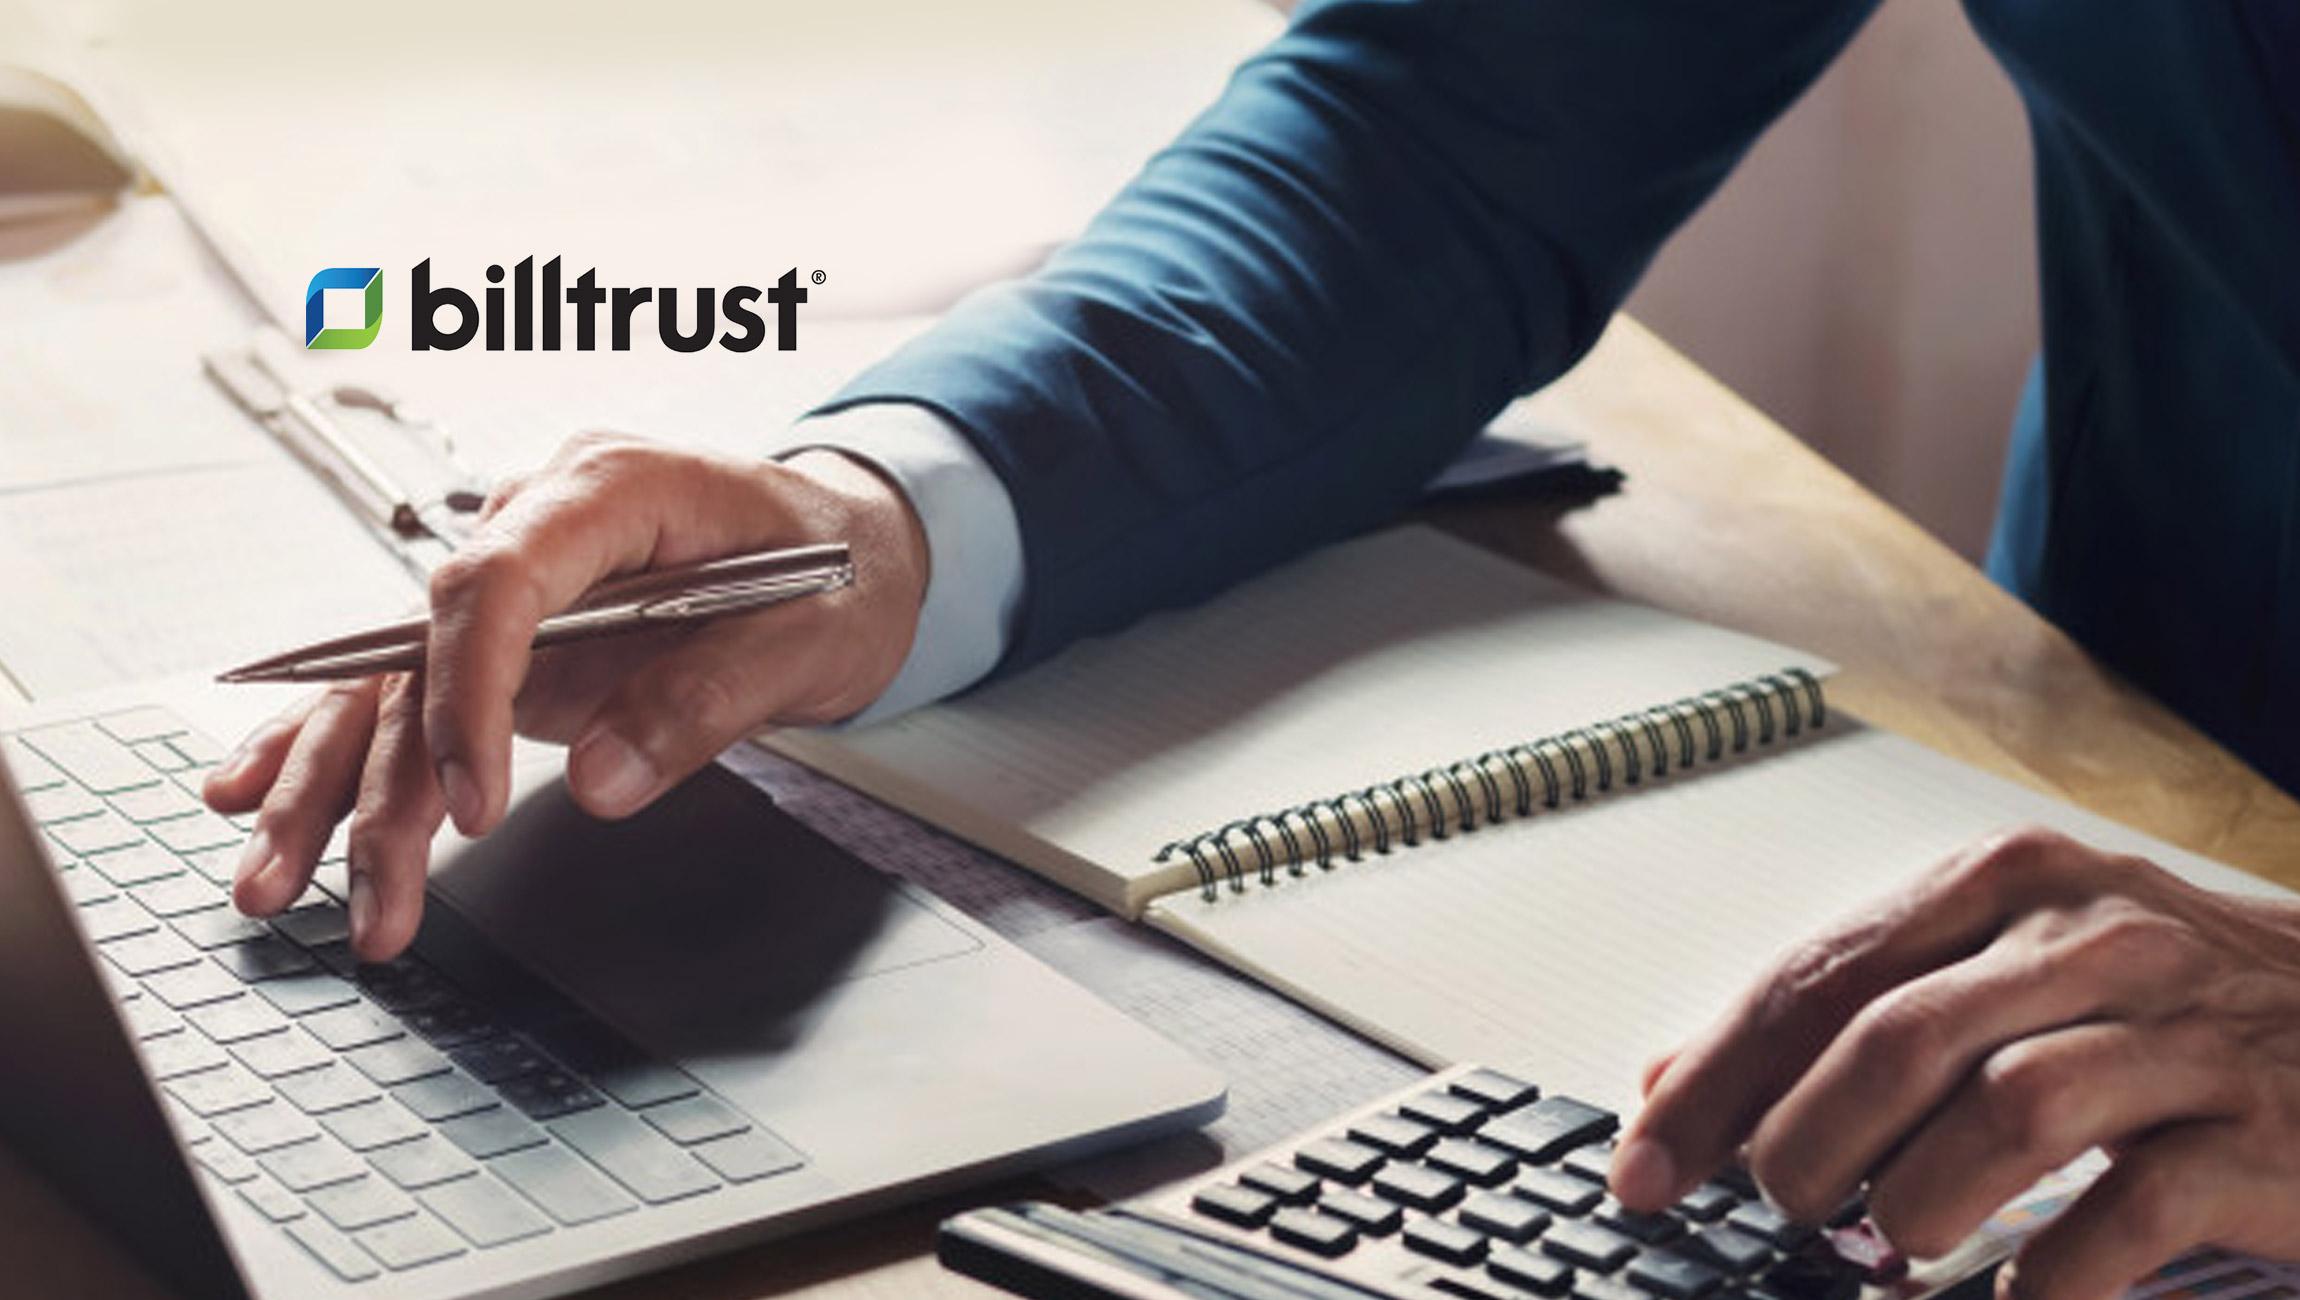 Billtrust Launches Smart Credit Application to Improve the B2B Credit Process